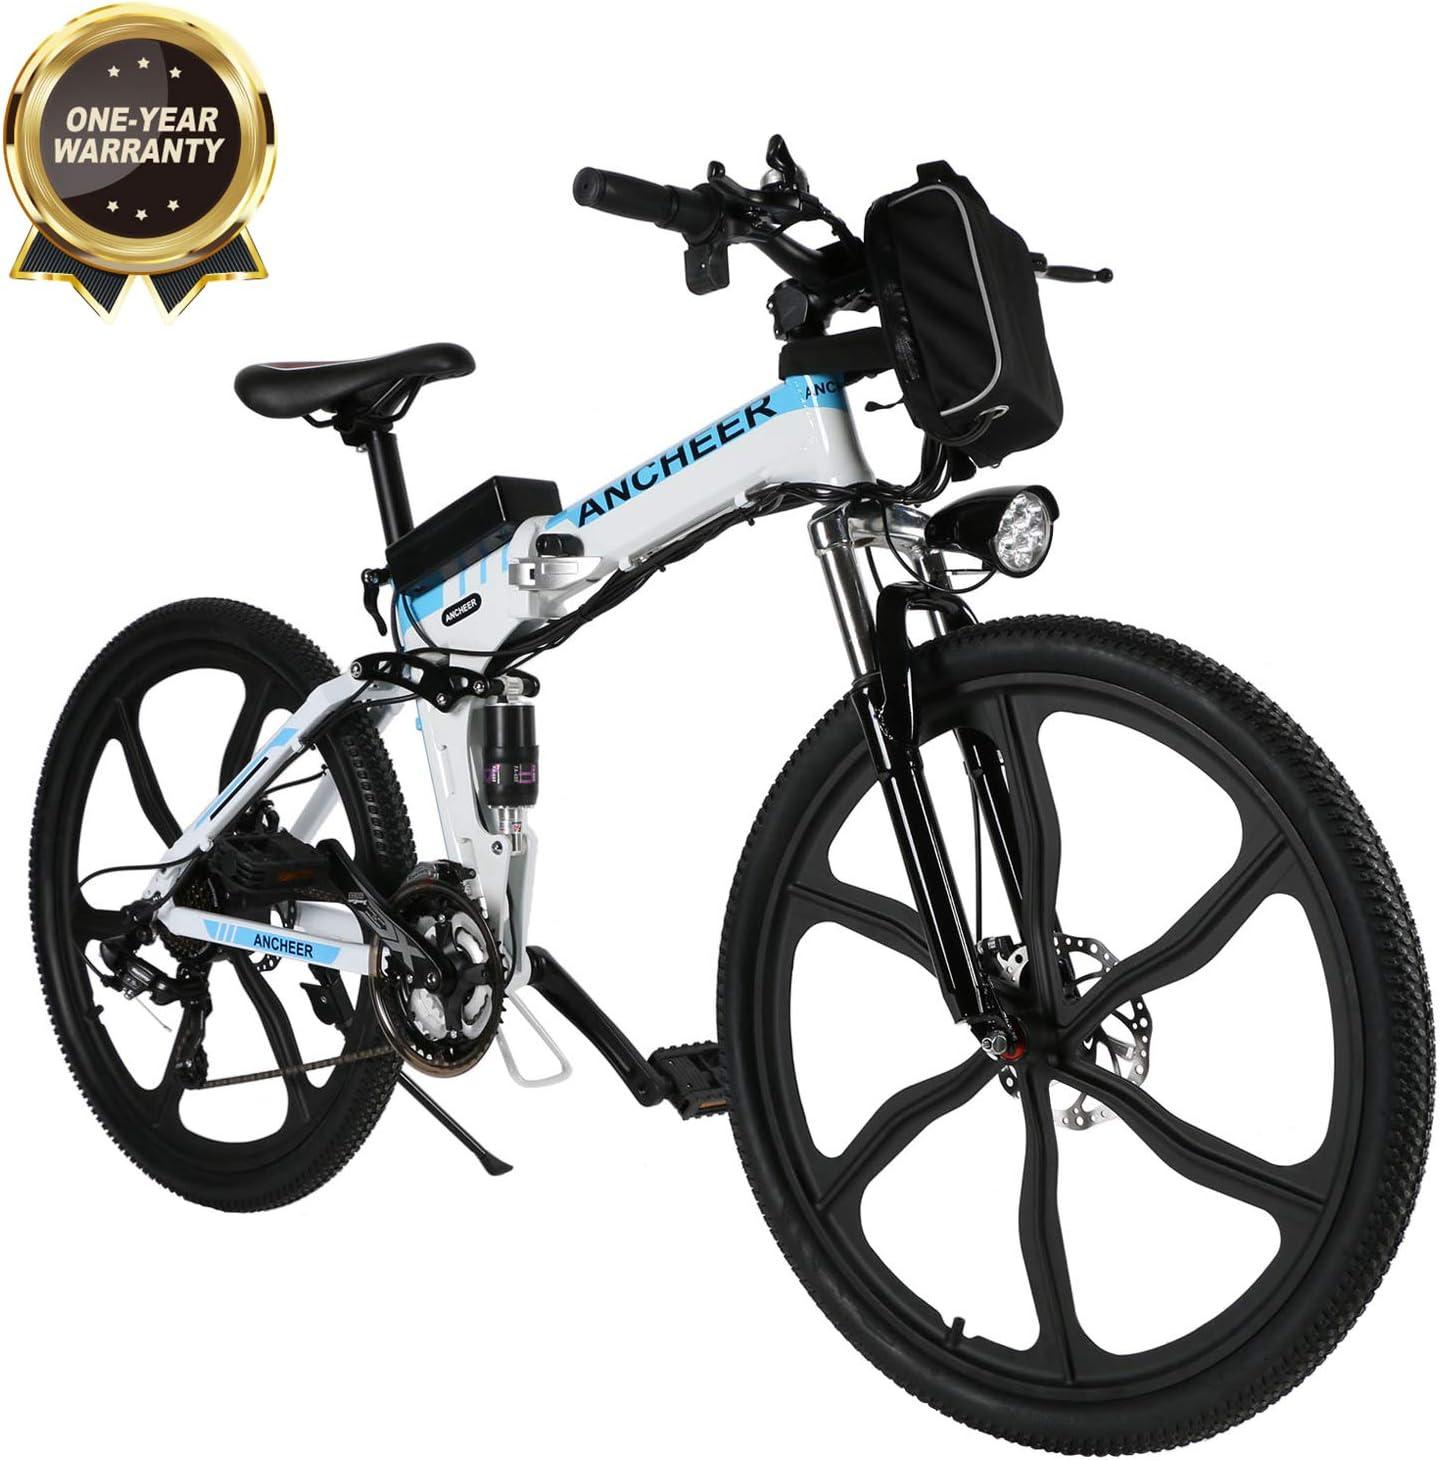 BIKFUN Bicicleta eléctrica Plegable, Bicicleta de Trabajo, E-Bike,Fold 20